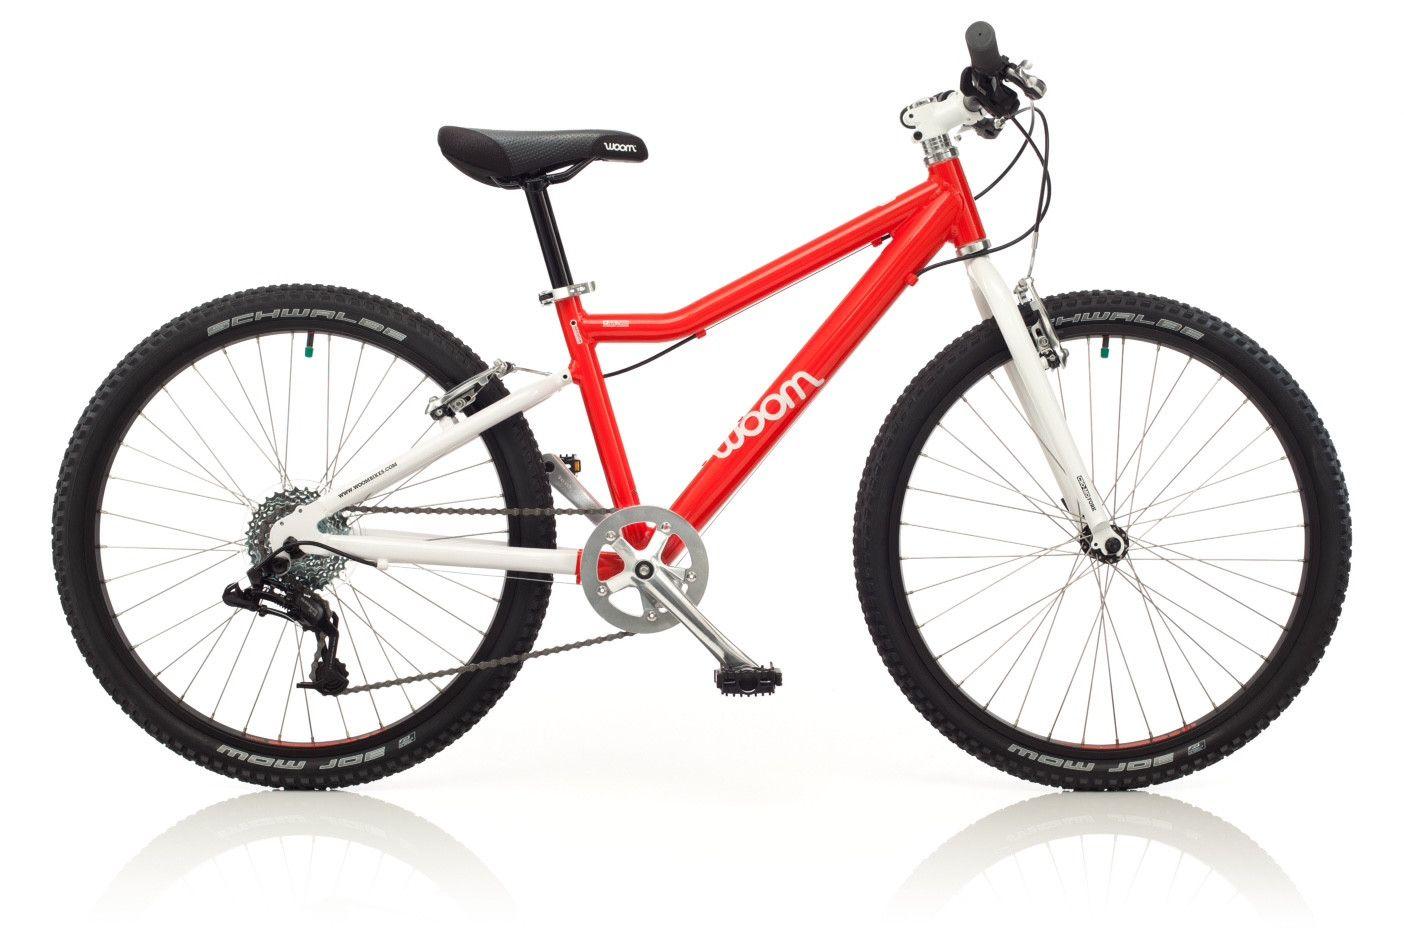 Buy Woom Bike Woom 3 Sram Automatix Rear Hub Woom Bike Road